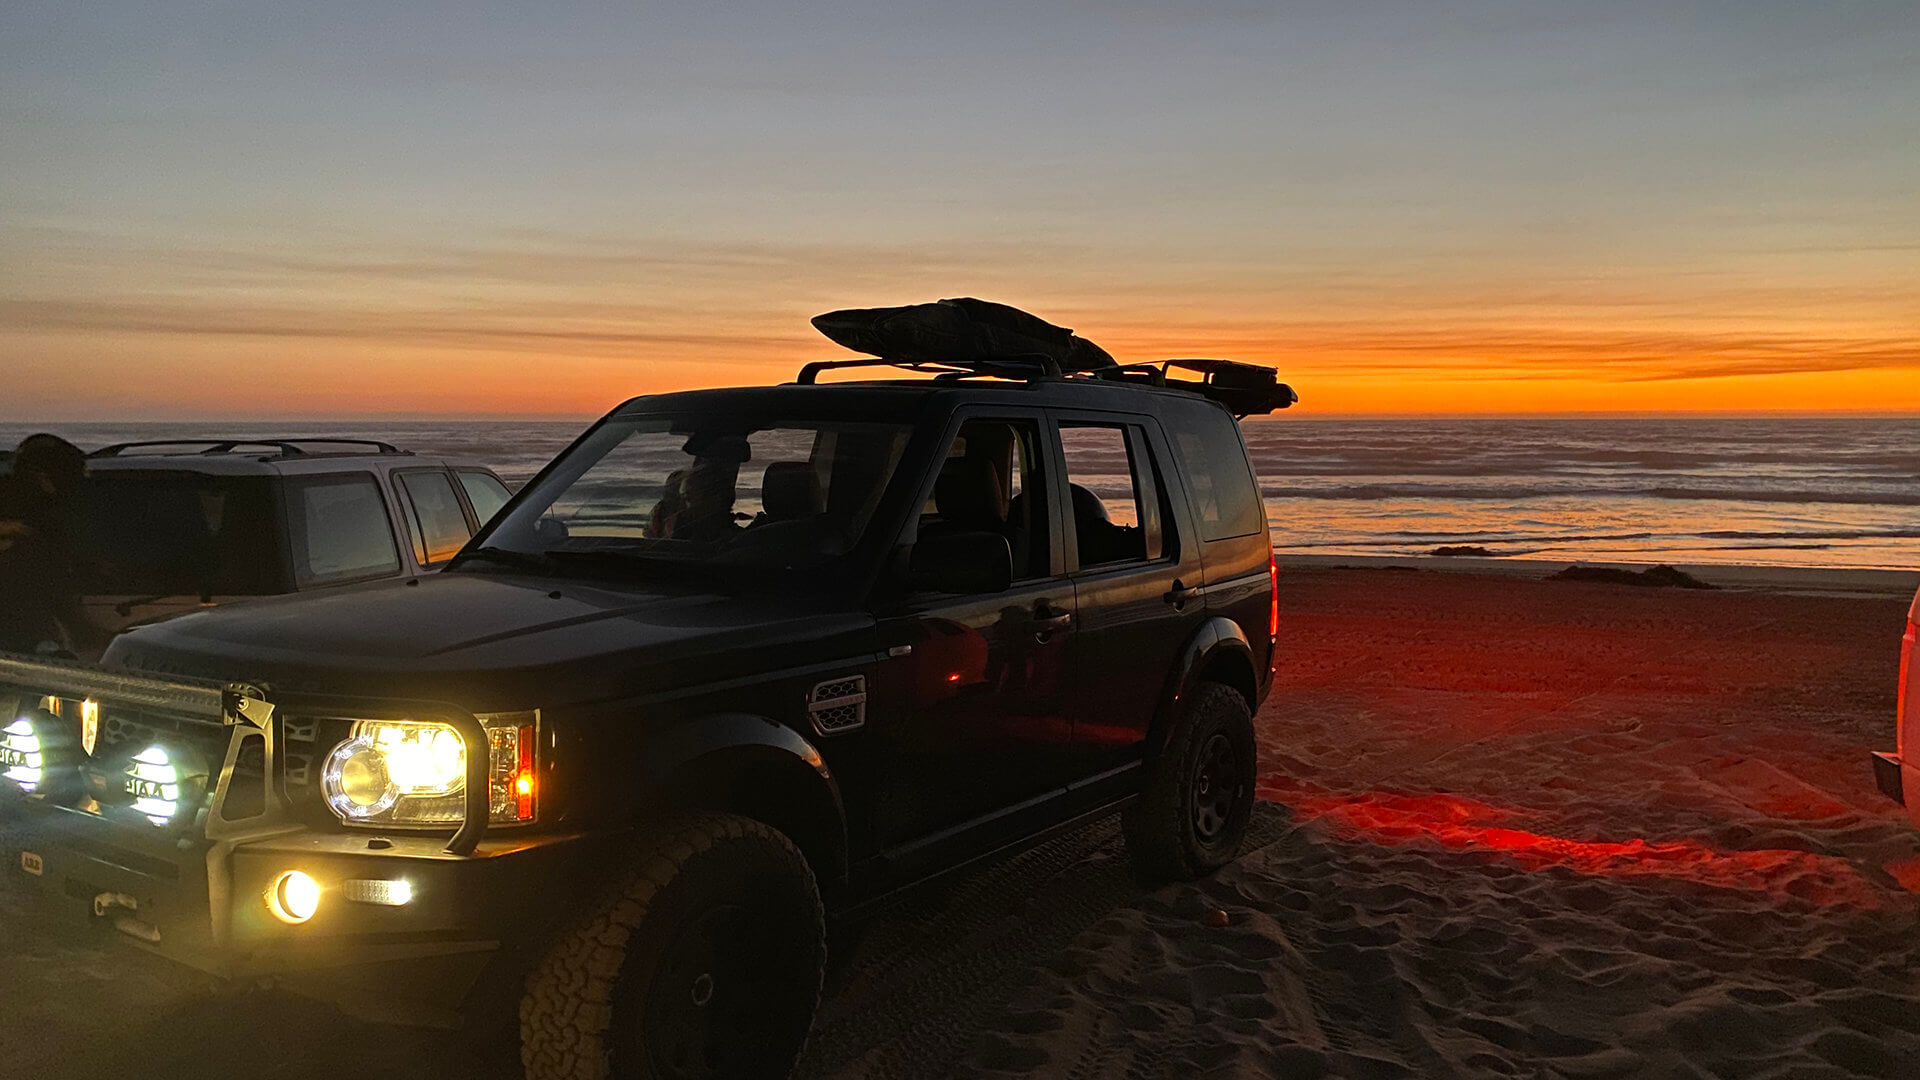 Pismo-Beach_LR4_TravisBrewer.ninja